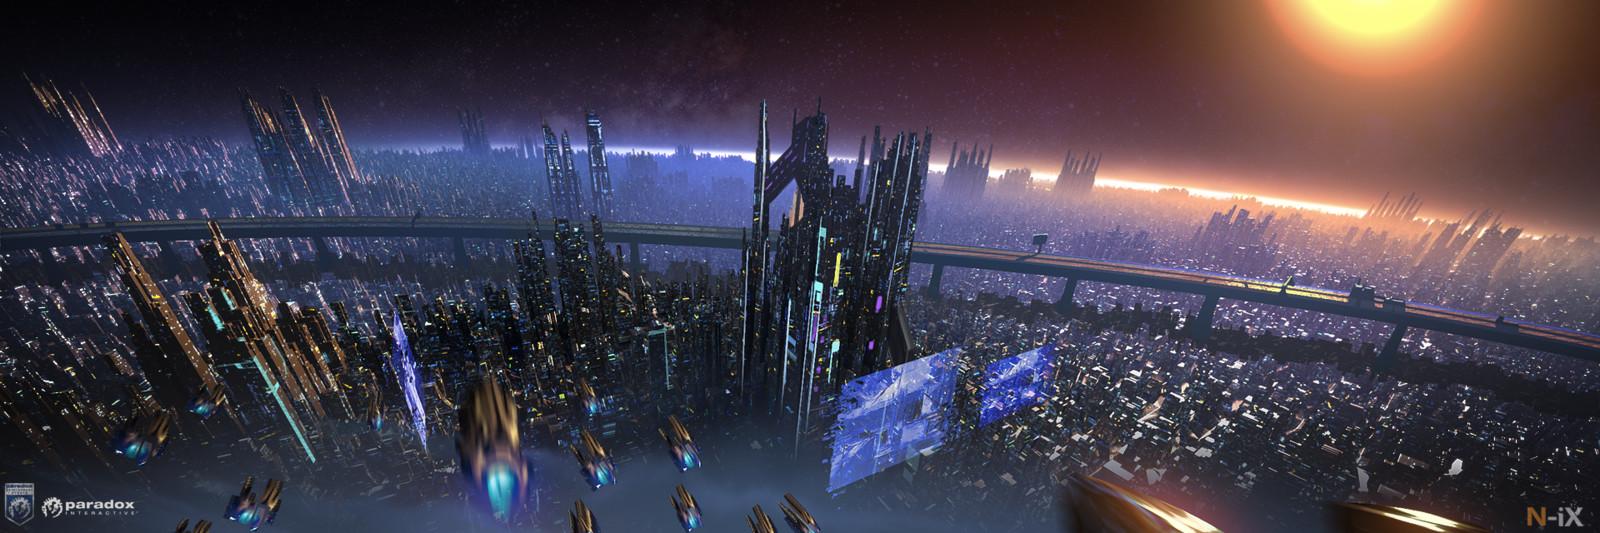 City-planet